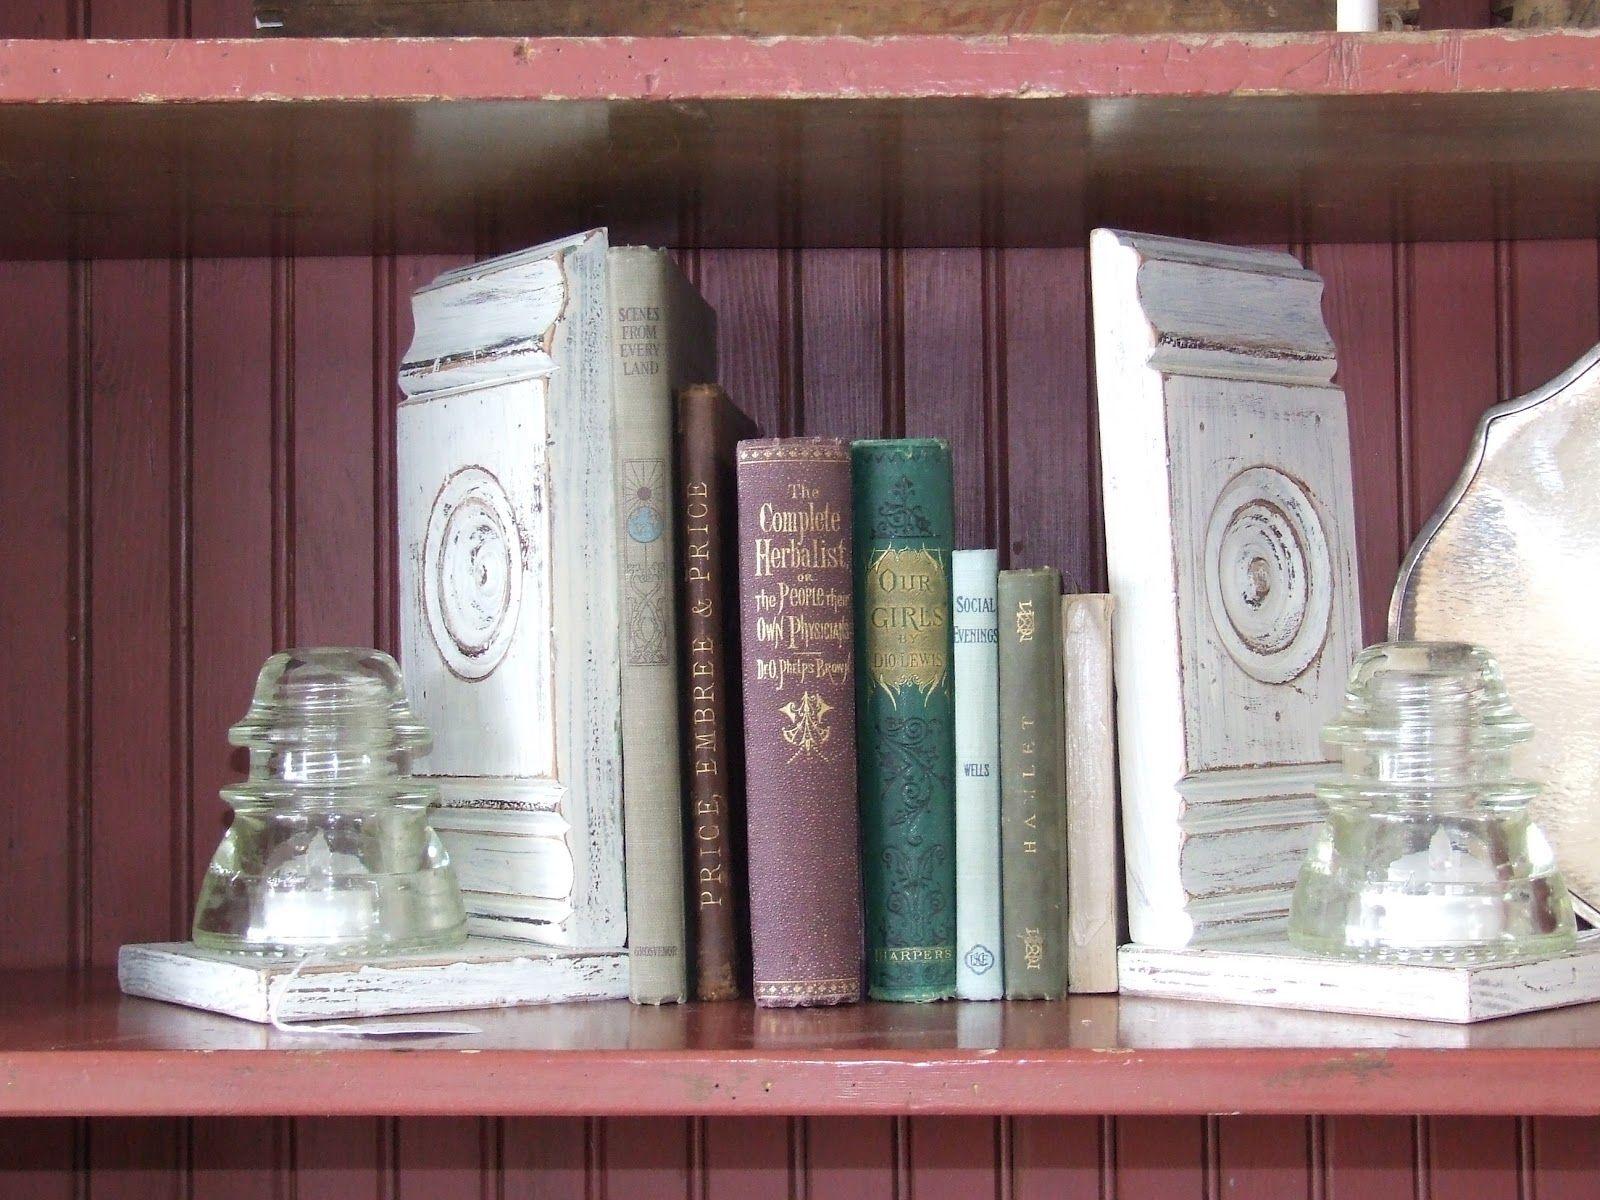 Somethin' Salvaged: repurposed items